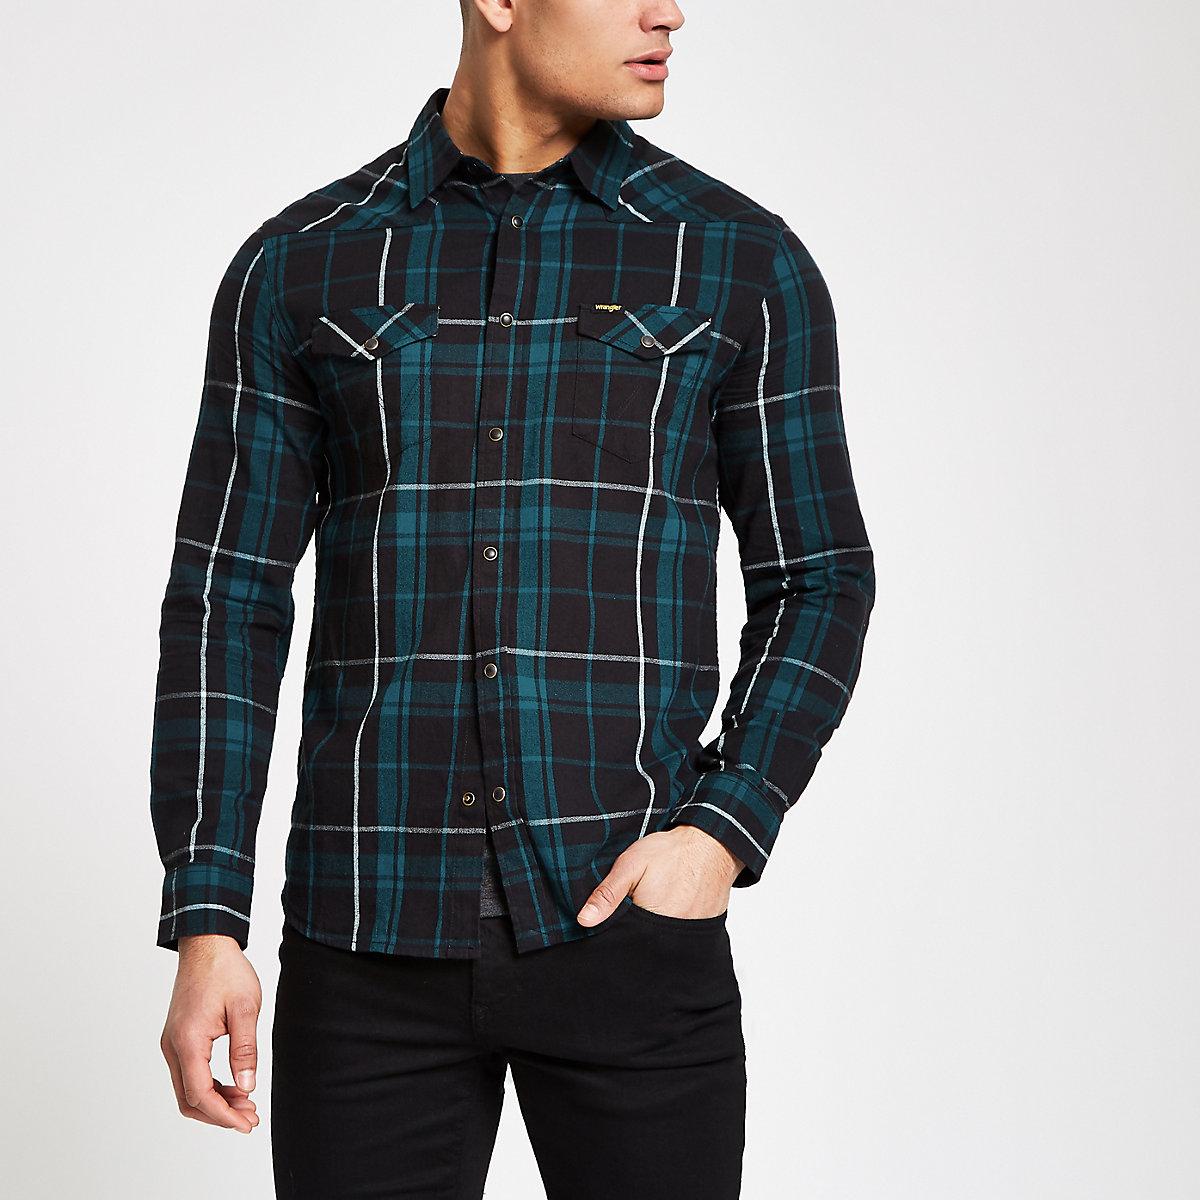 Wrangler green check long sleeve shirt